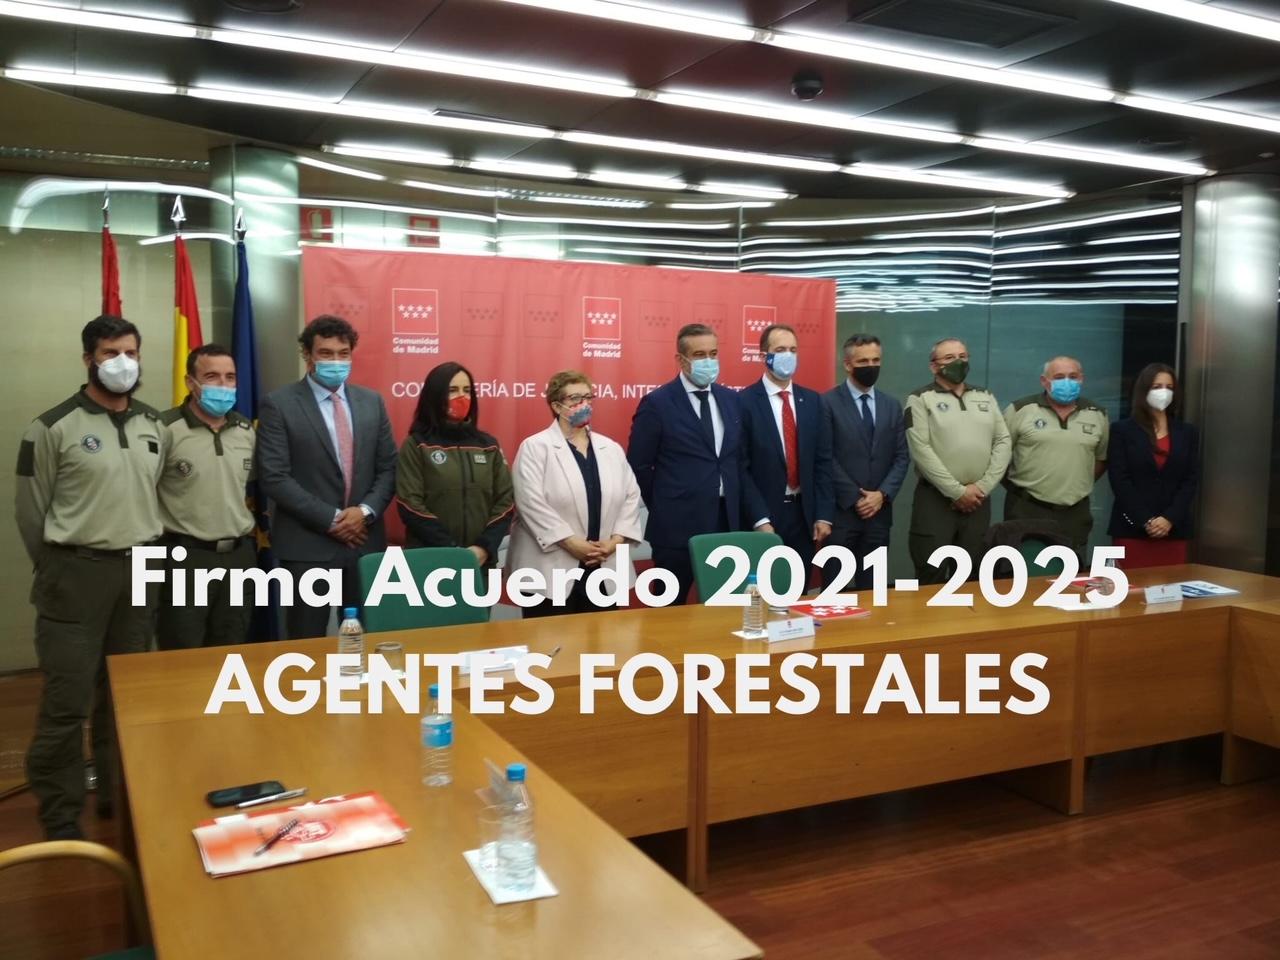 Firma acuerdo Agentes forestales 2021-2025